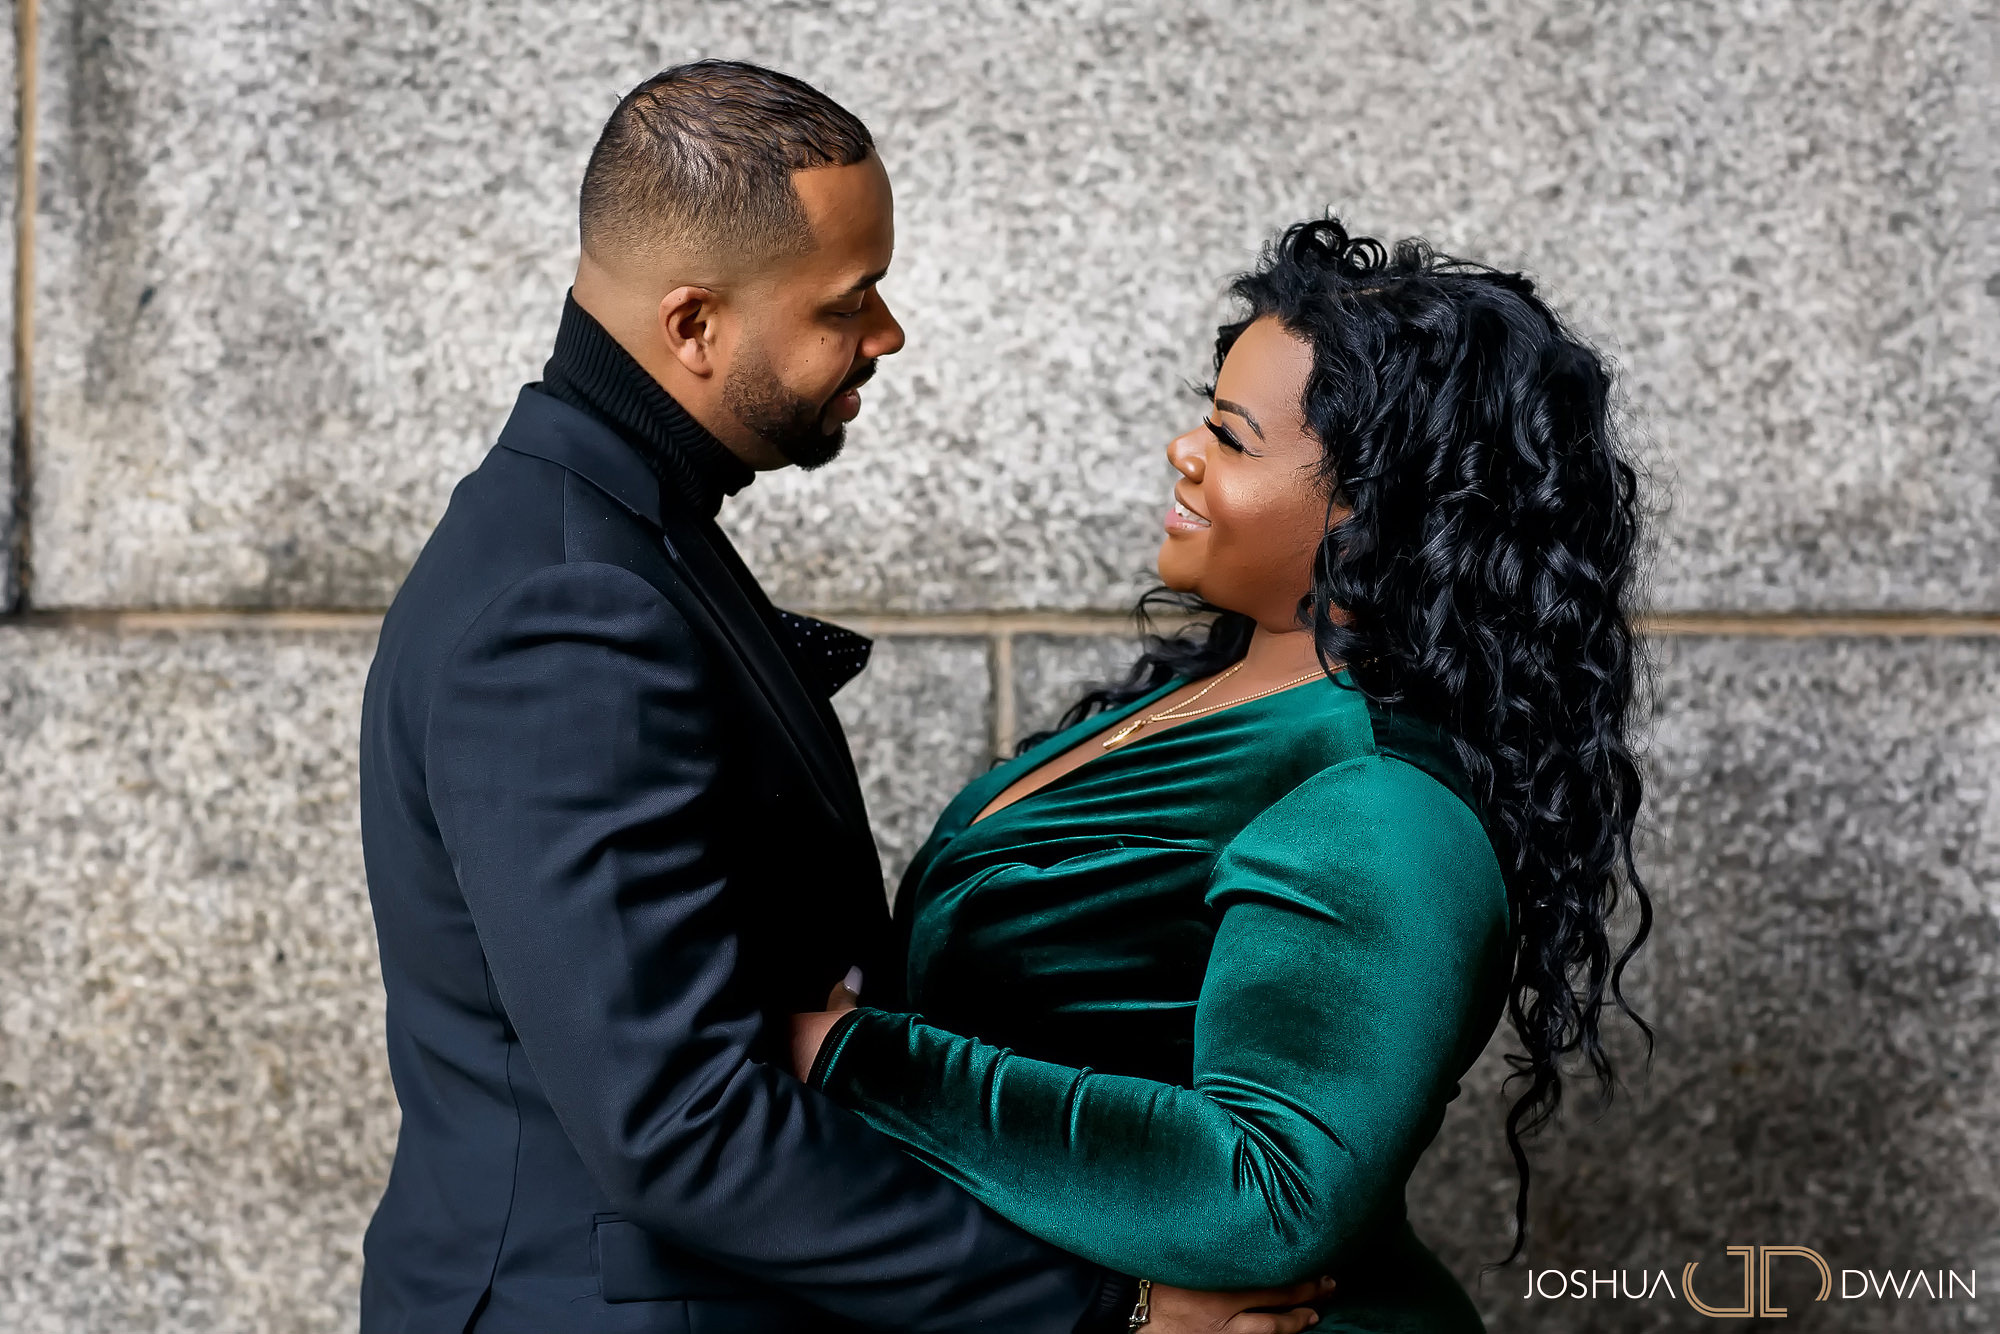 melisa-lloyd-002-brooklyn-dumbo-engagement-photos-matthew-ellis-joshua-dwain